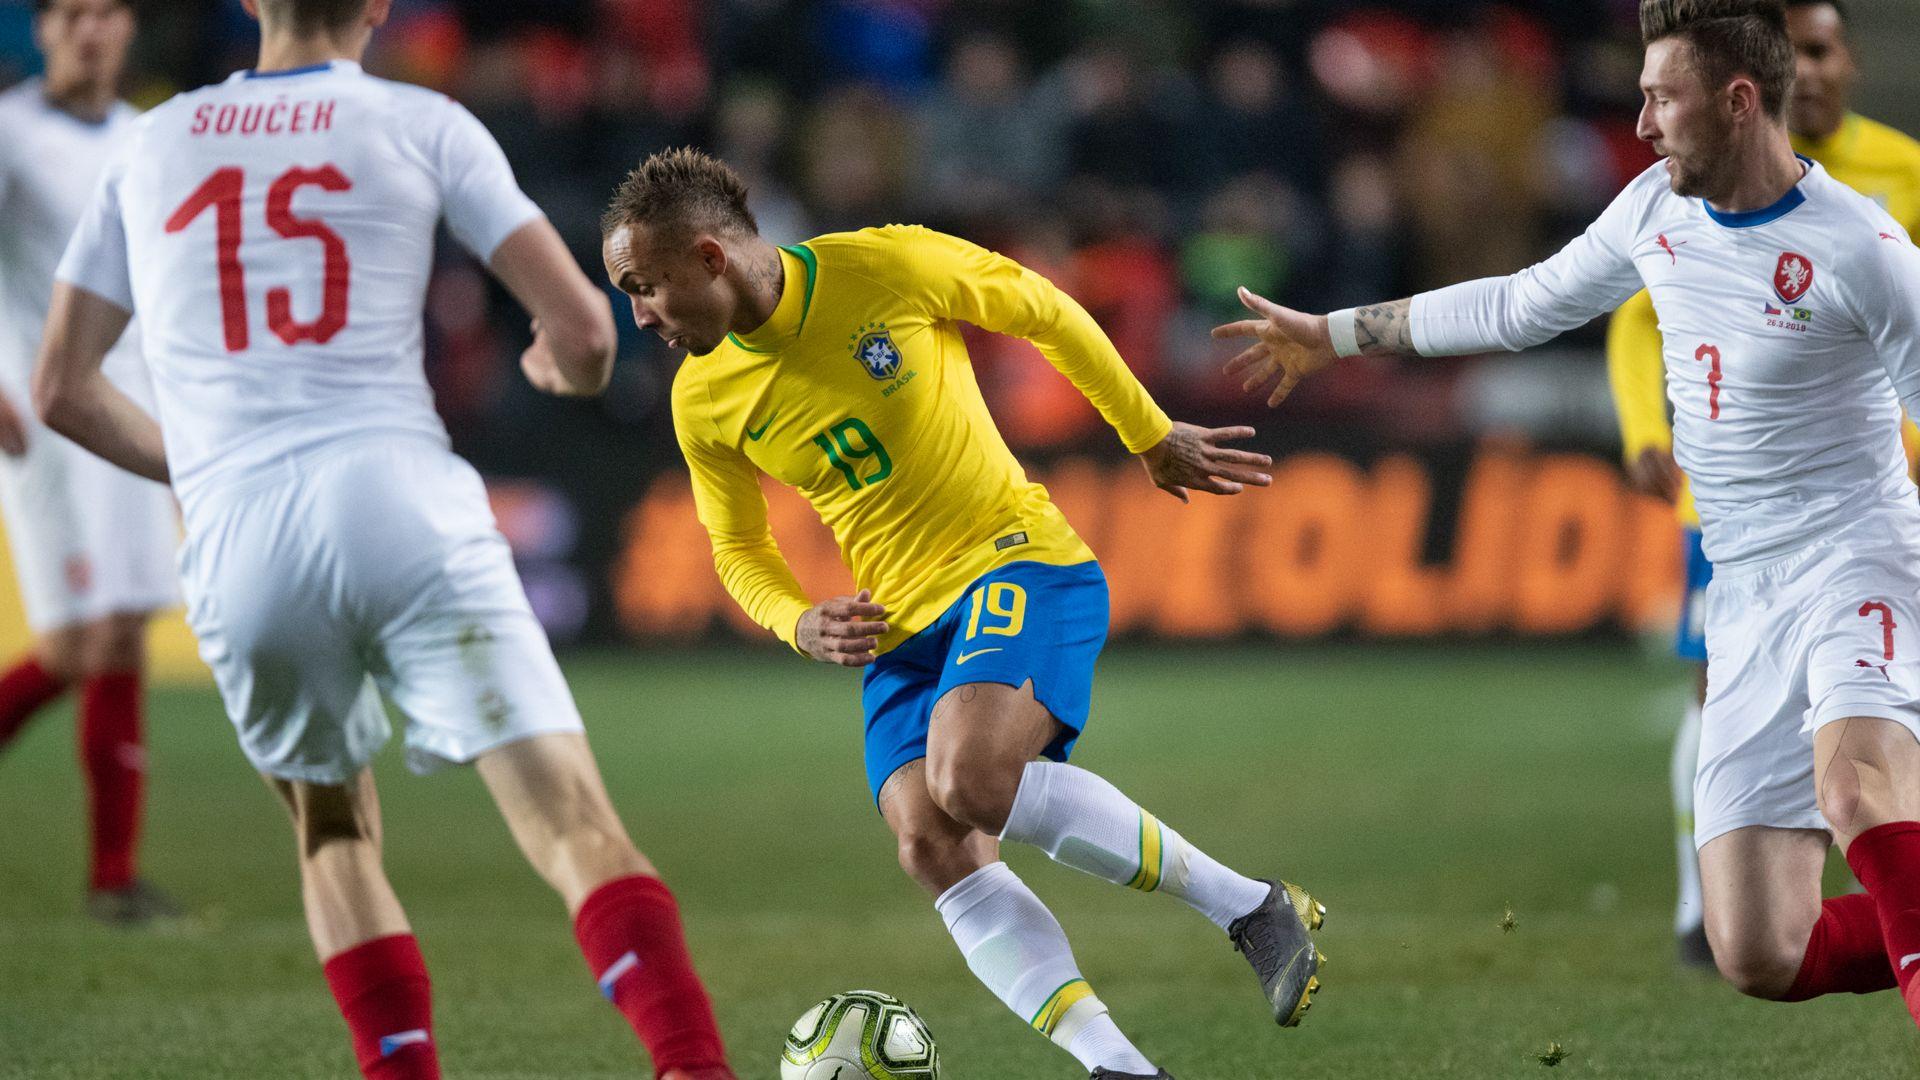 Everton Brazil Czech Republic Friendly 26032019